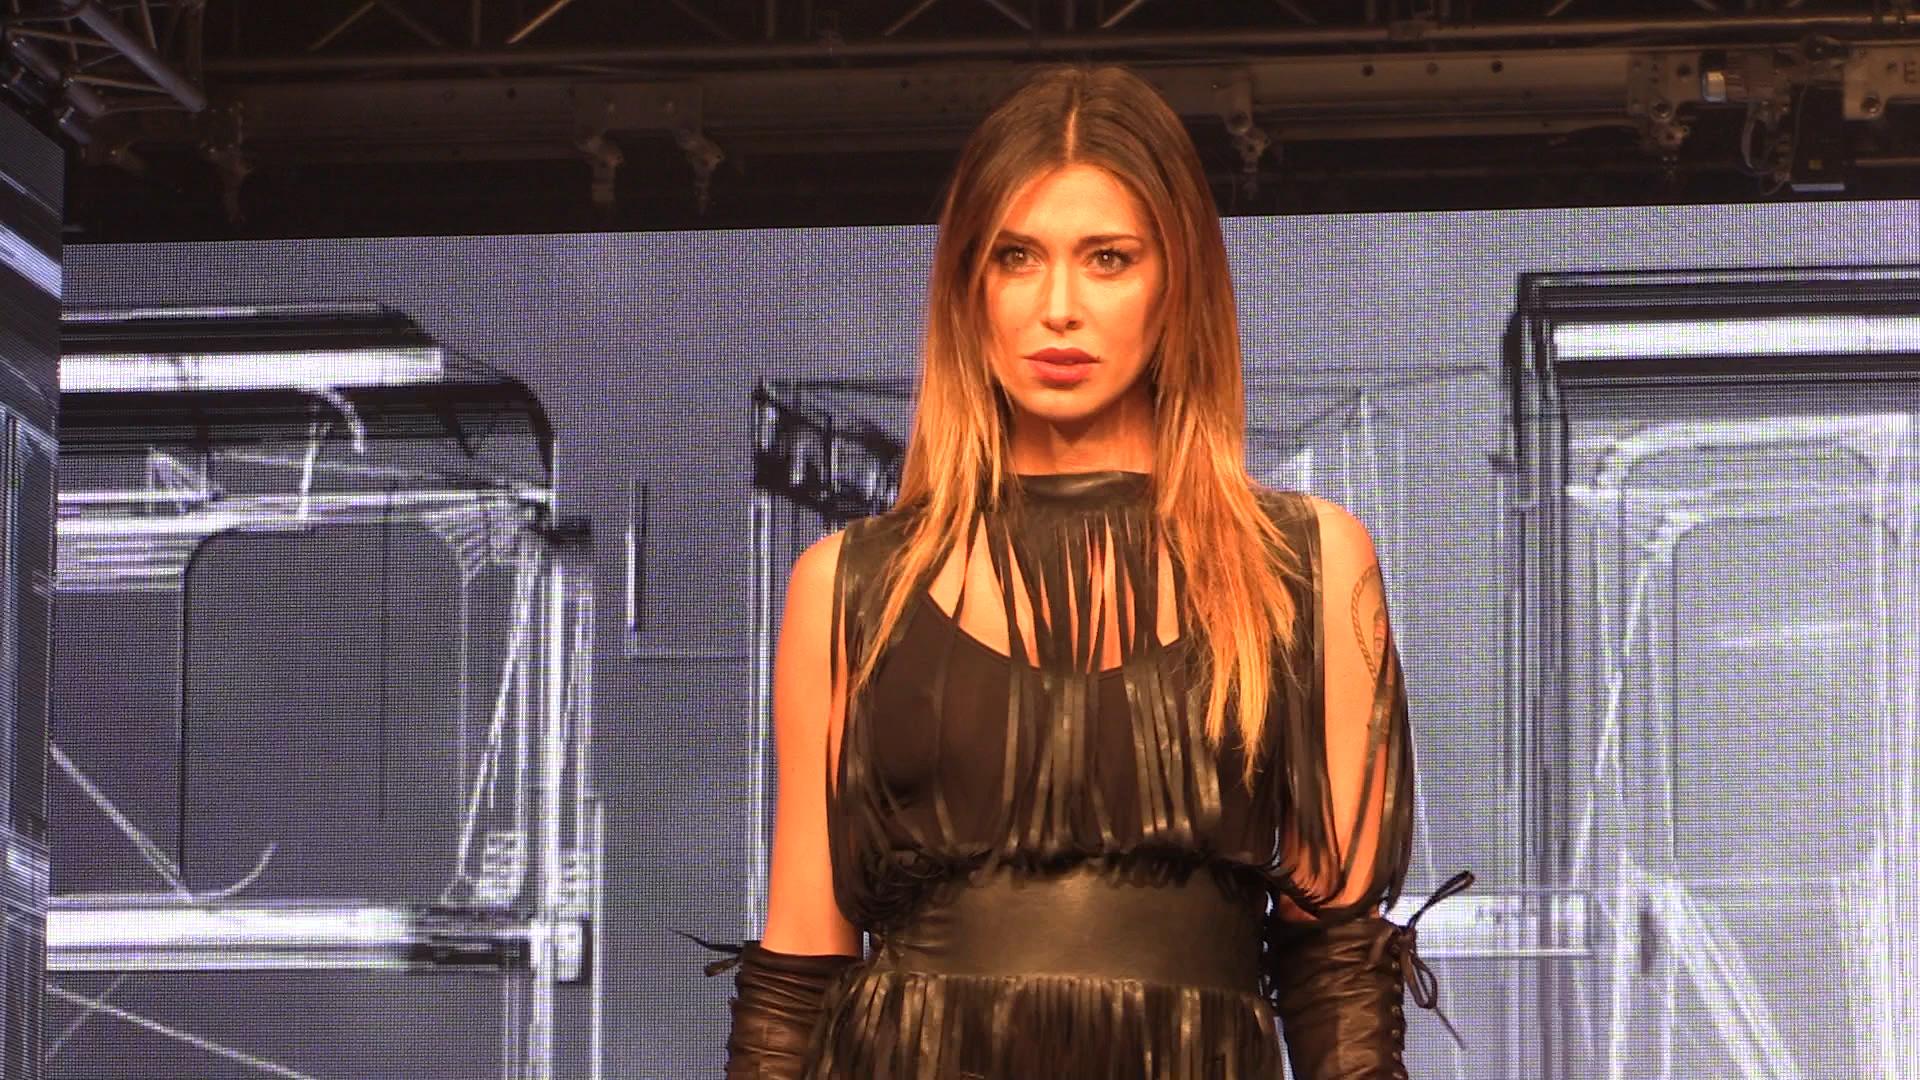 Belén Rodriguez, hot in shorts di pelle sulla passerella di Imperfect (VIDEO)